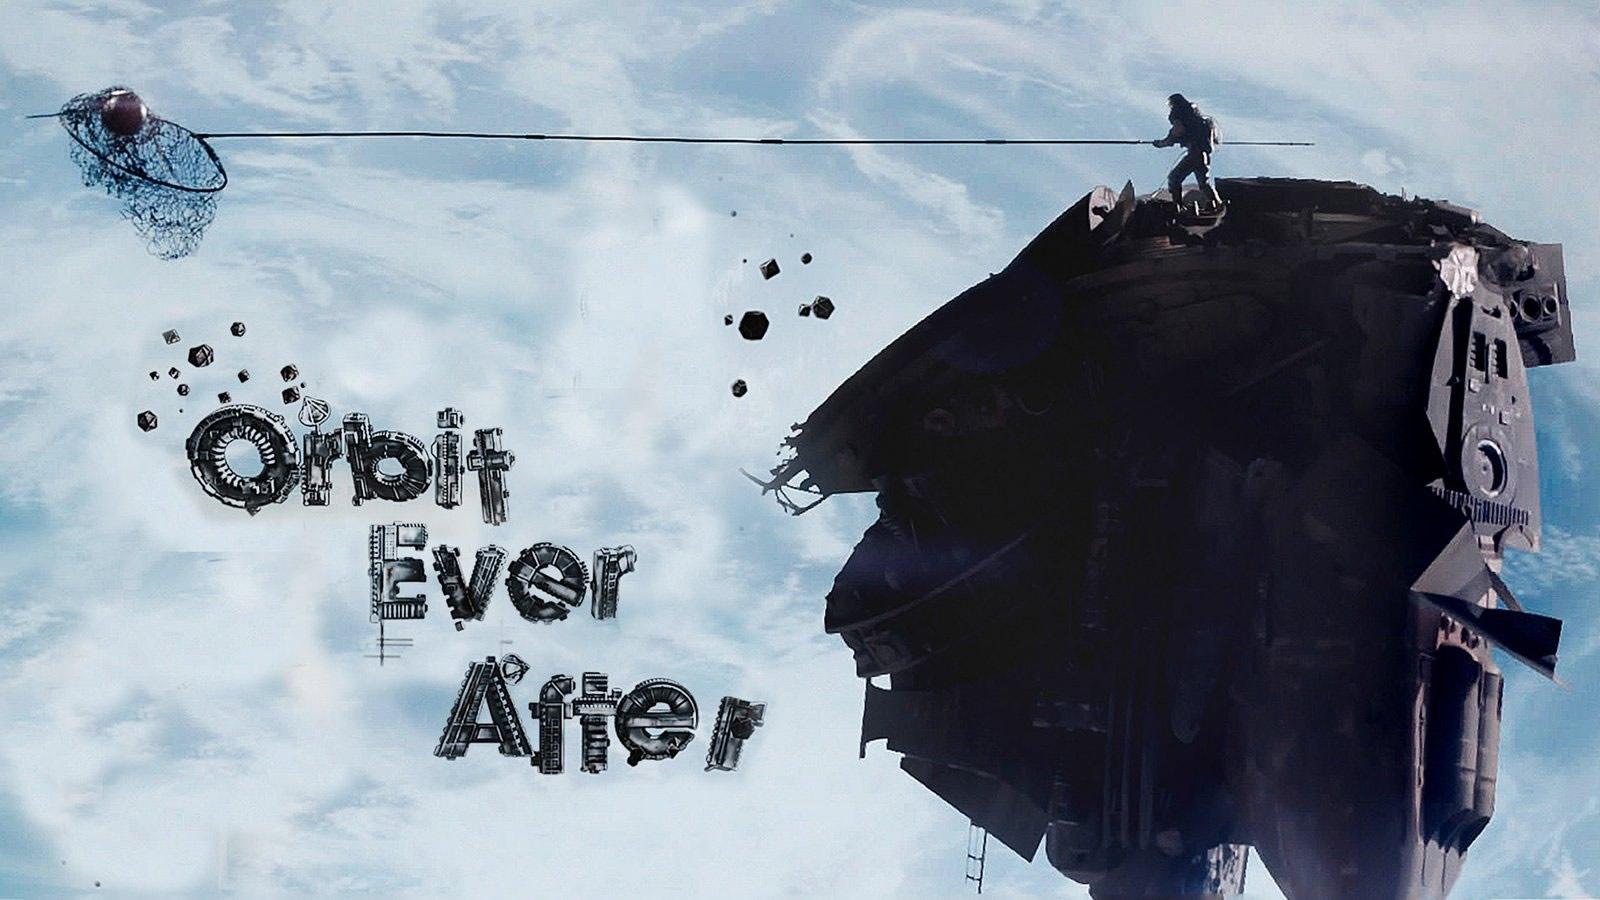 orbit ever after curta metragem ficcao cientifica com thomas brodie sangster poster - Orbit Ever After | Curta-metragem de ficção científica com Thomas Brodie-Sangster e Mackenzie Crook